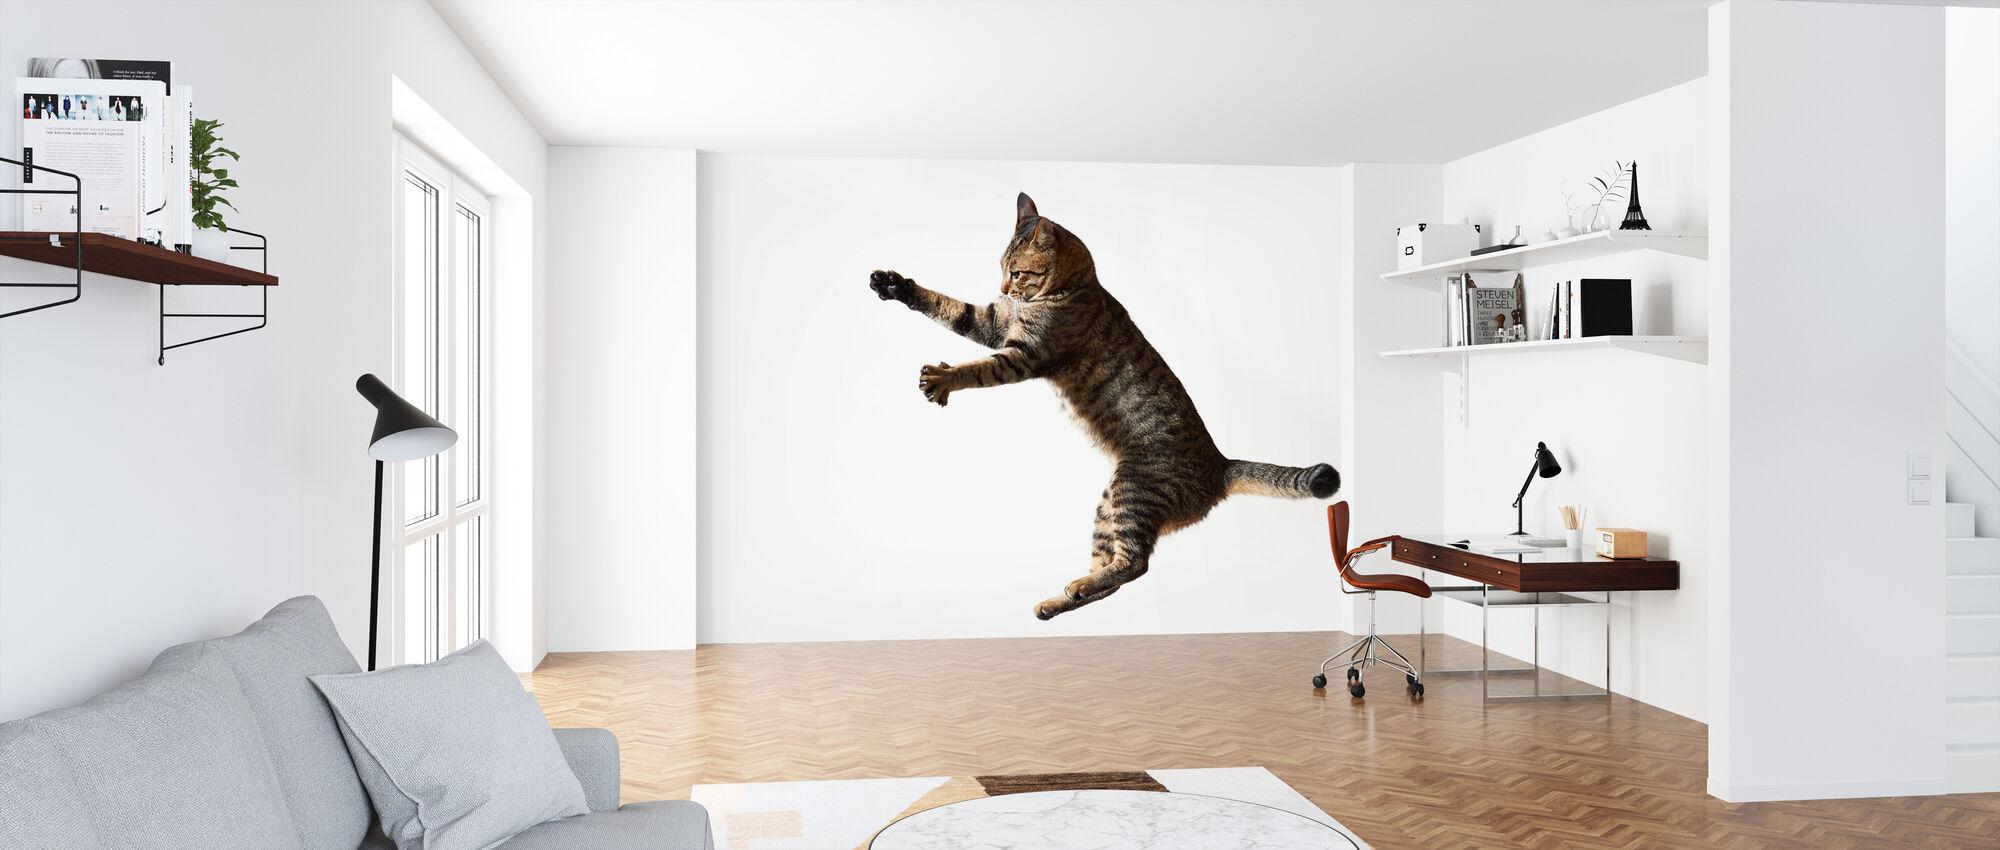 Big Jump - Wallpaper - Office